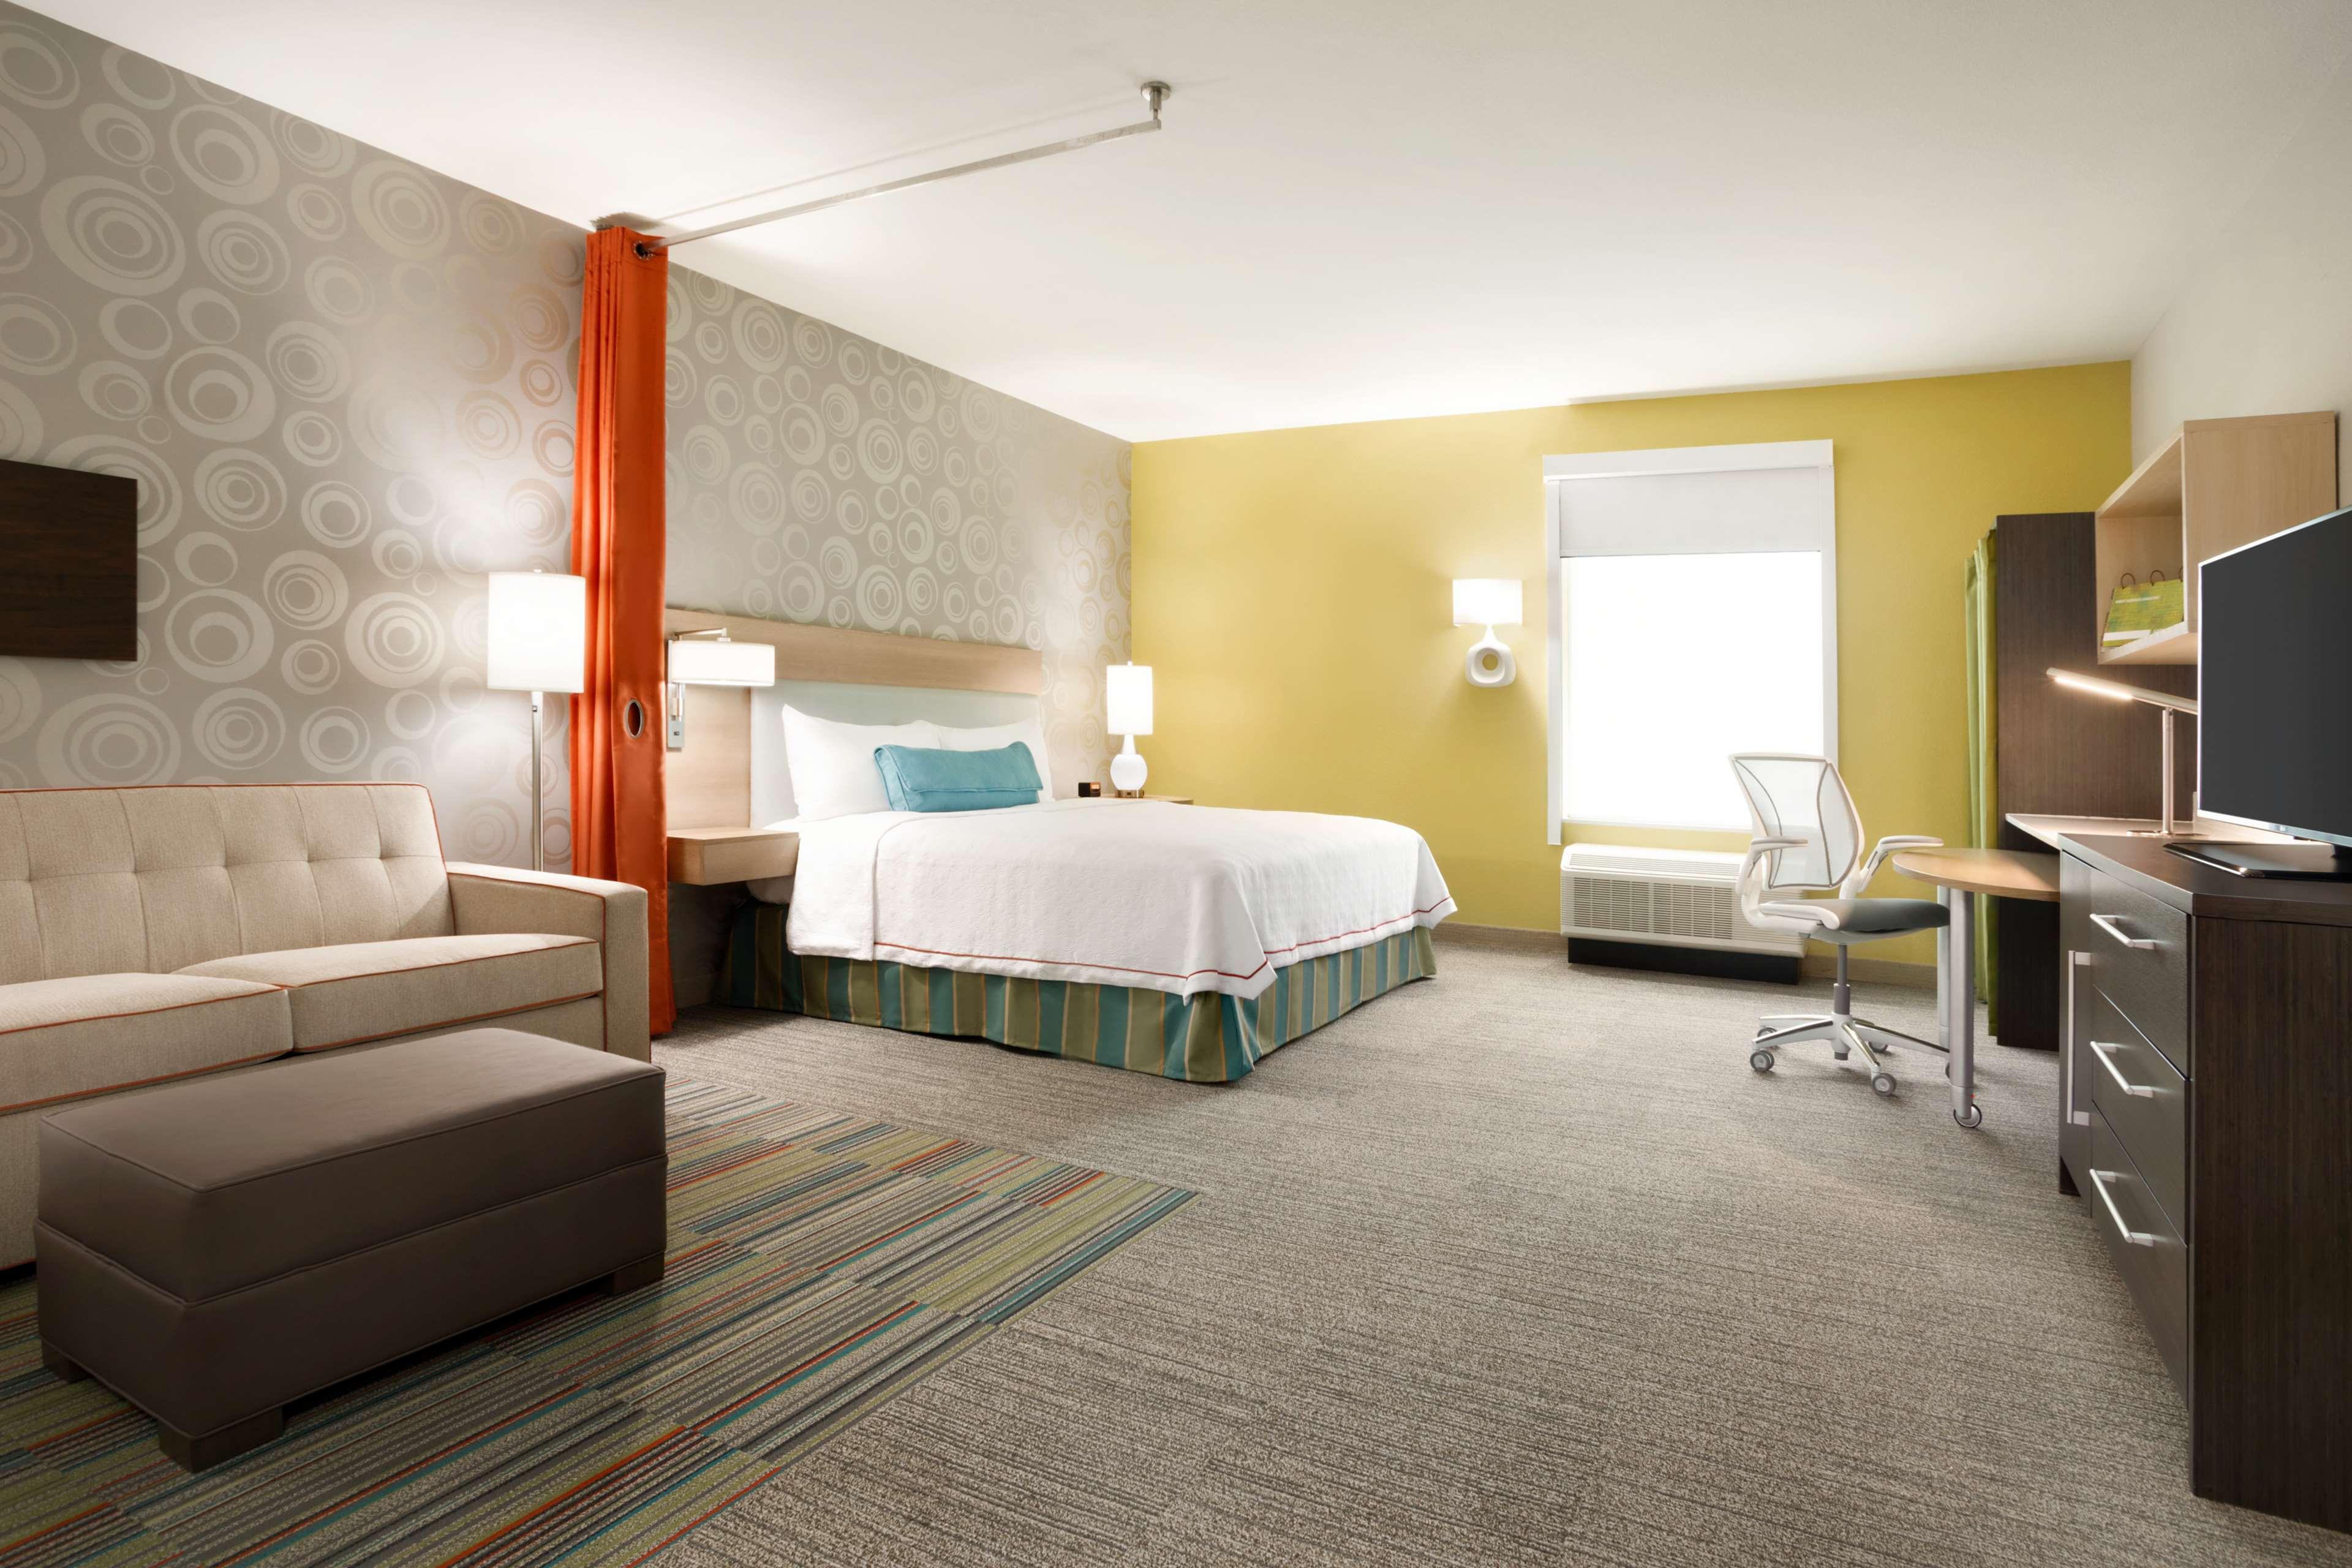 Home2 Suites by Hilton Houston/Webster image 15